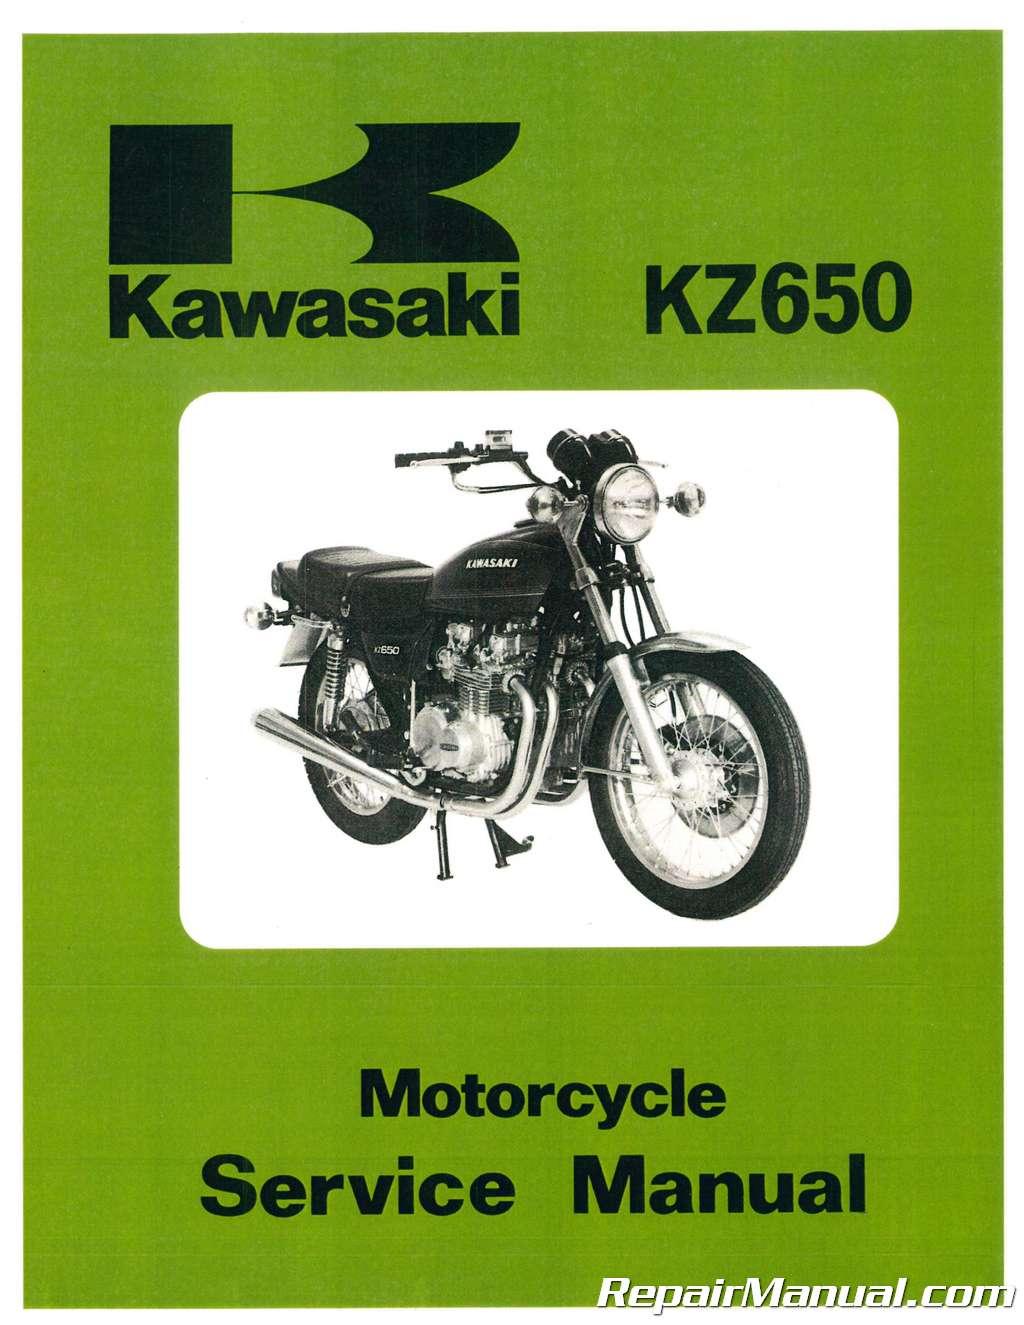 Takeuchi TB020 Compact Excavator Workshop Manual